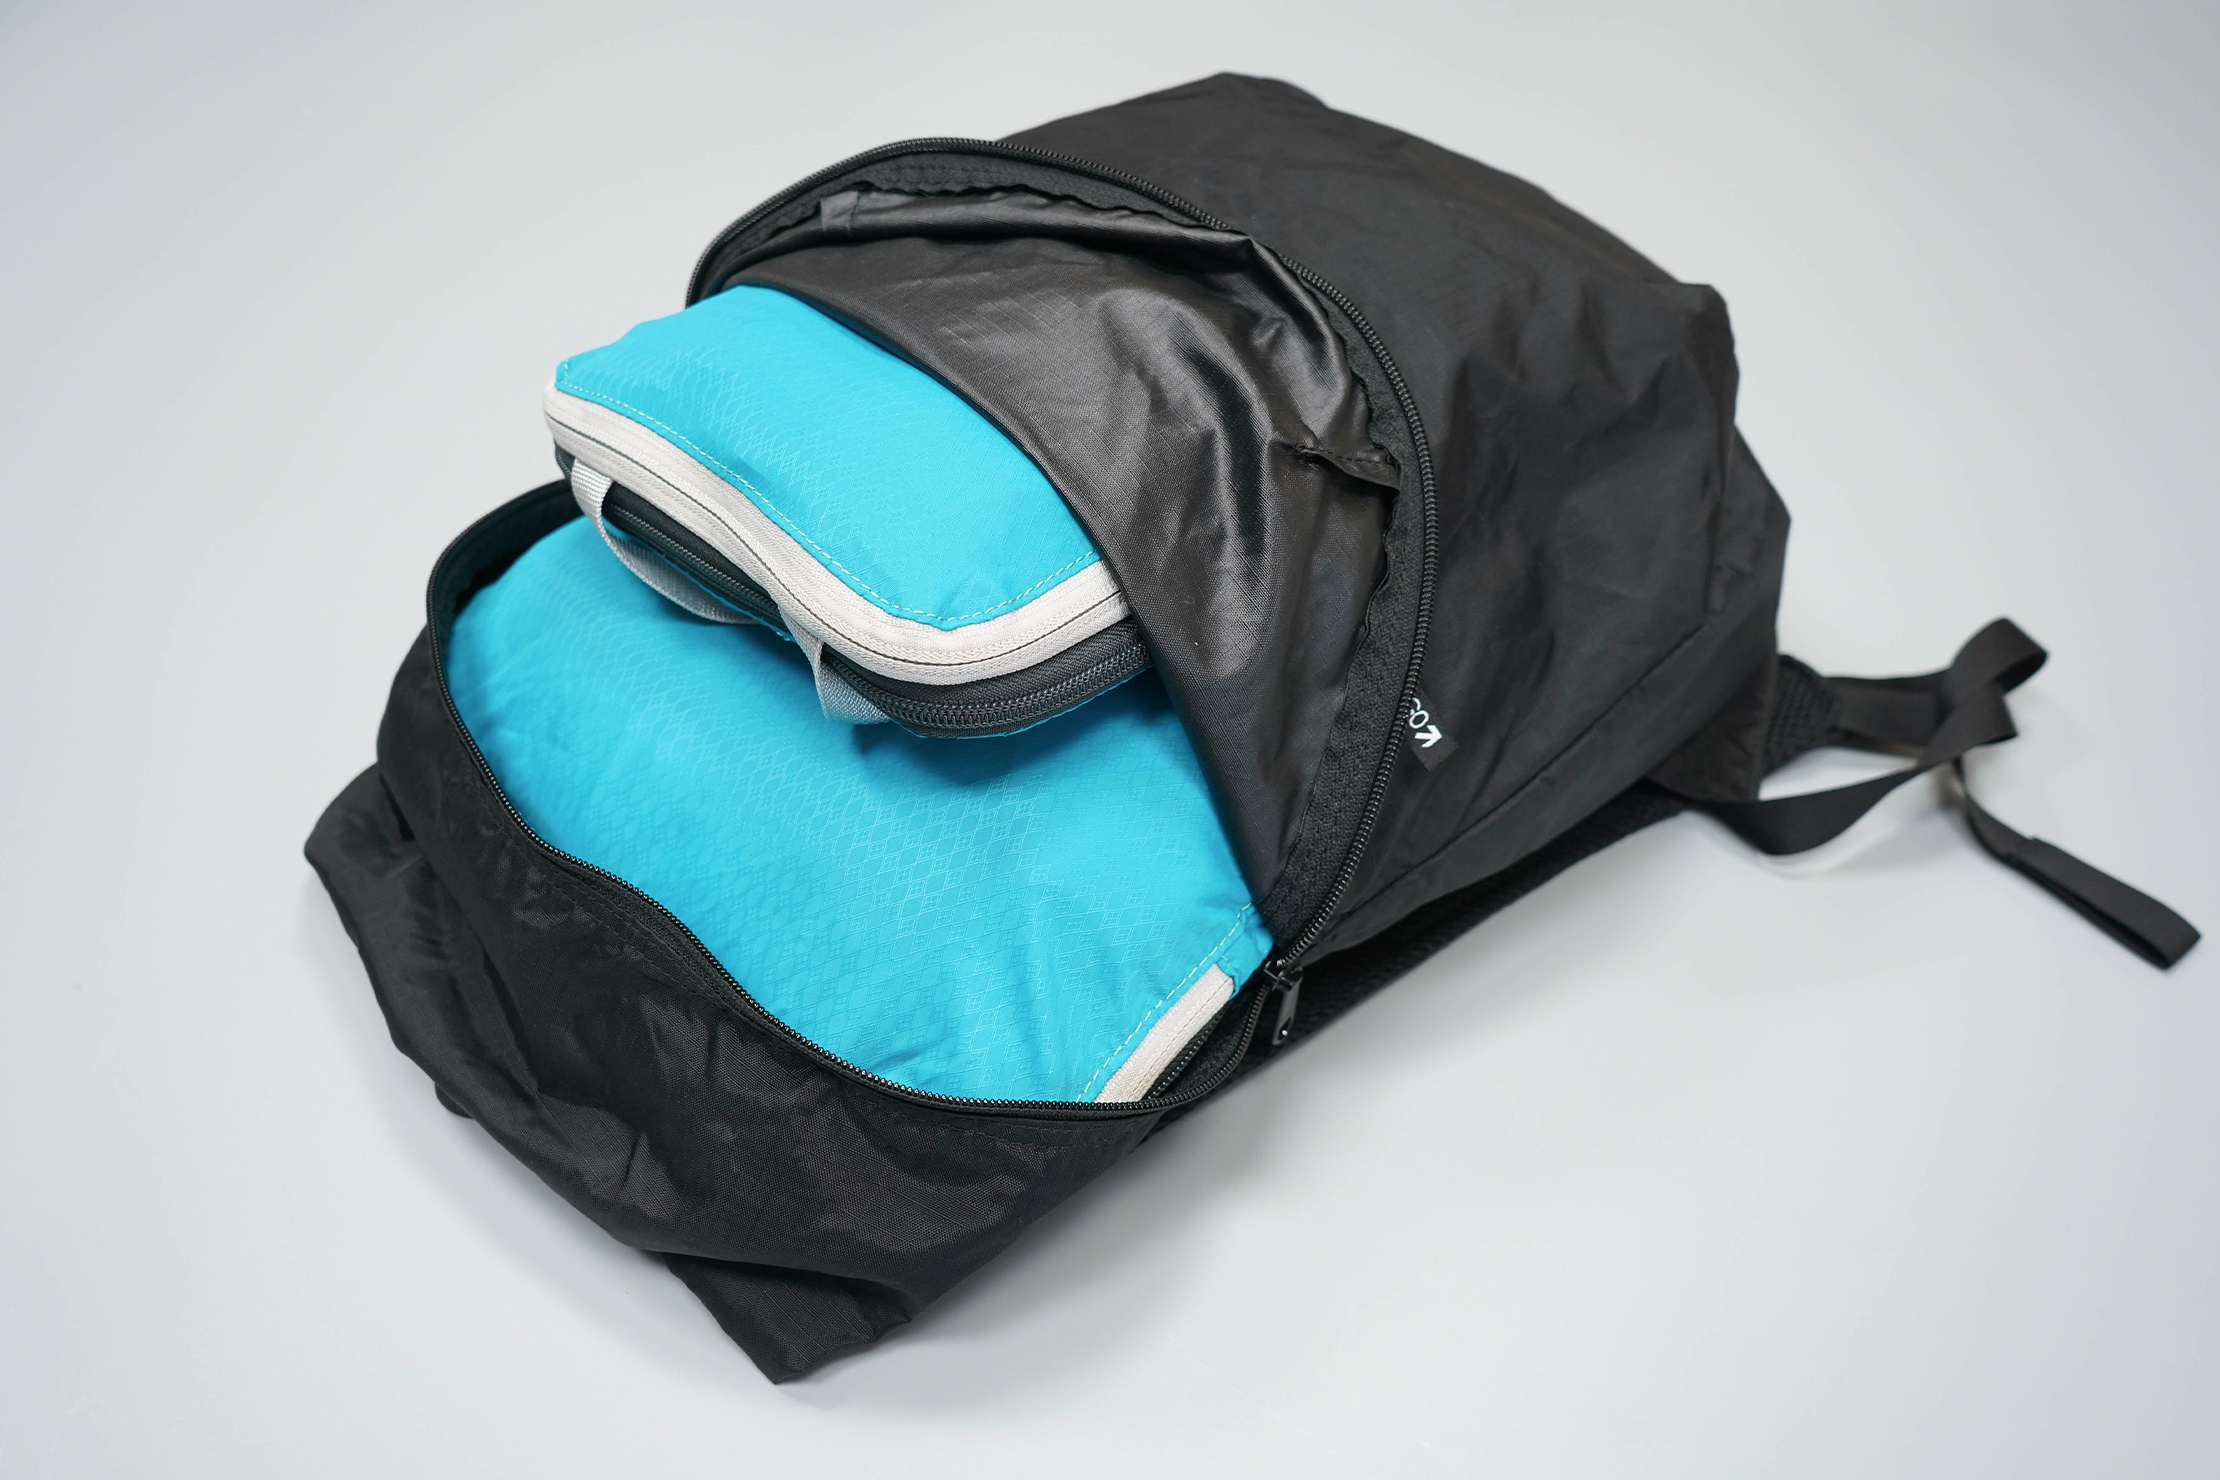 Kathmandu Pocket Pack V4 Main Compartment Packed